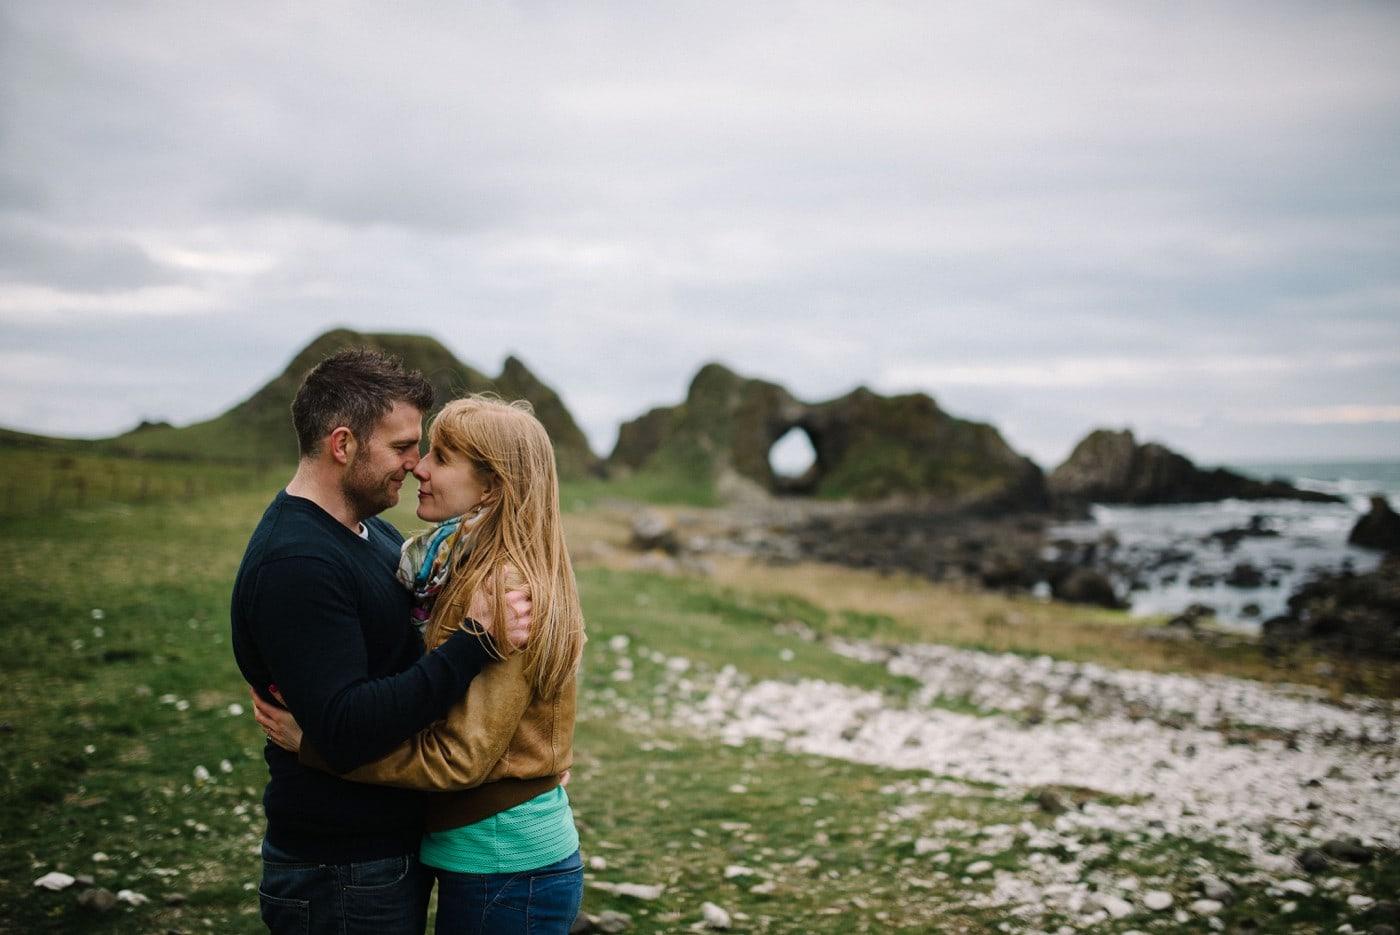 ballintoy-harbour-engagement-wedding-photographer-northern-ireland_0026